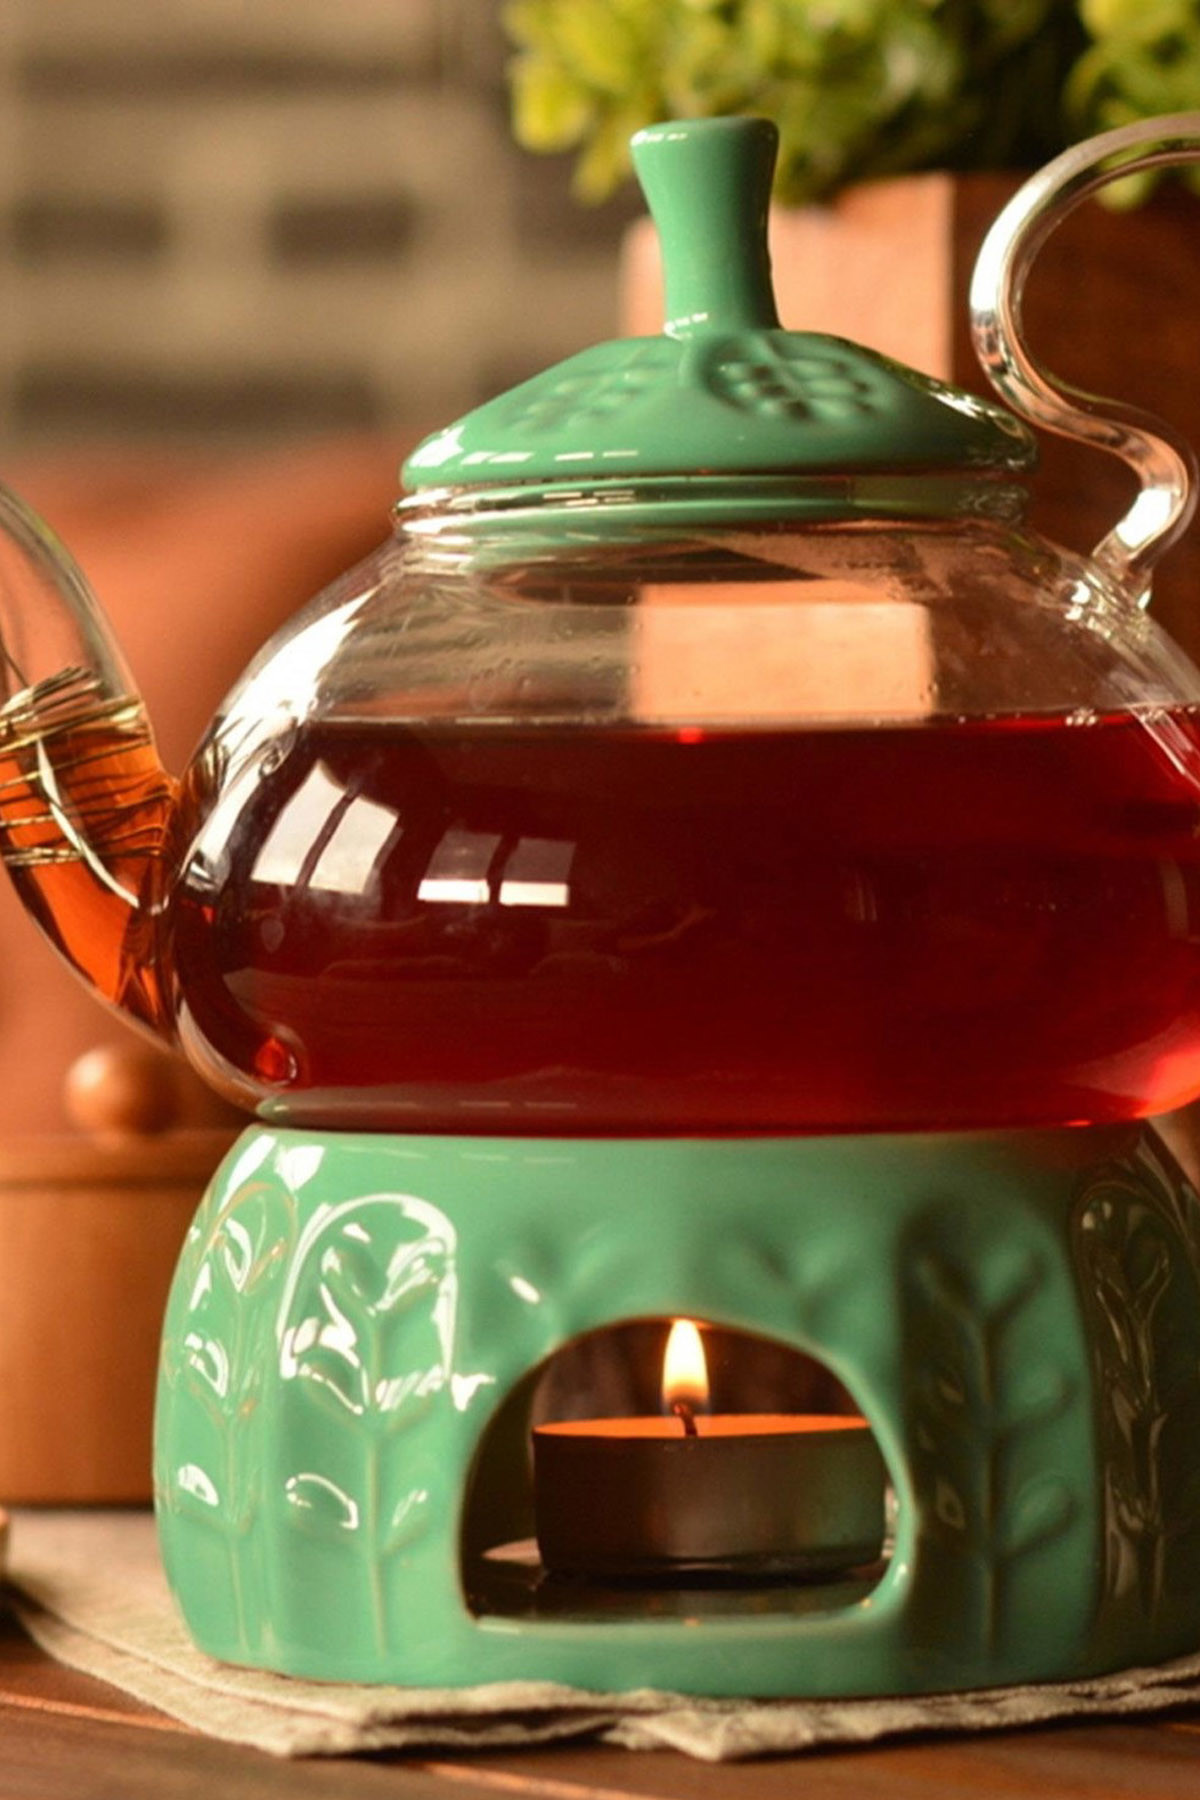 Sepetcibaba - Palida - Isıtıcılı Süzgeçli Demlik 600 ml Yeşil